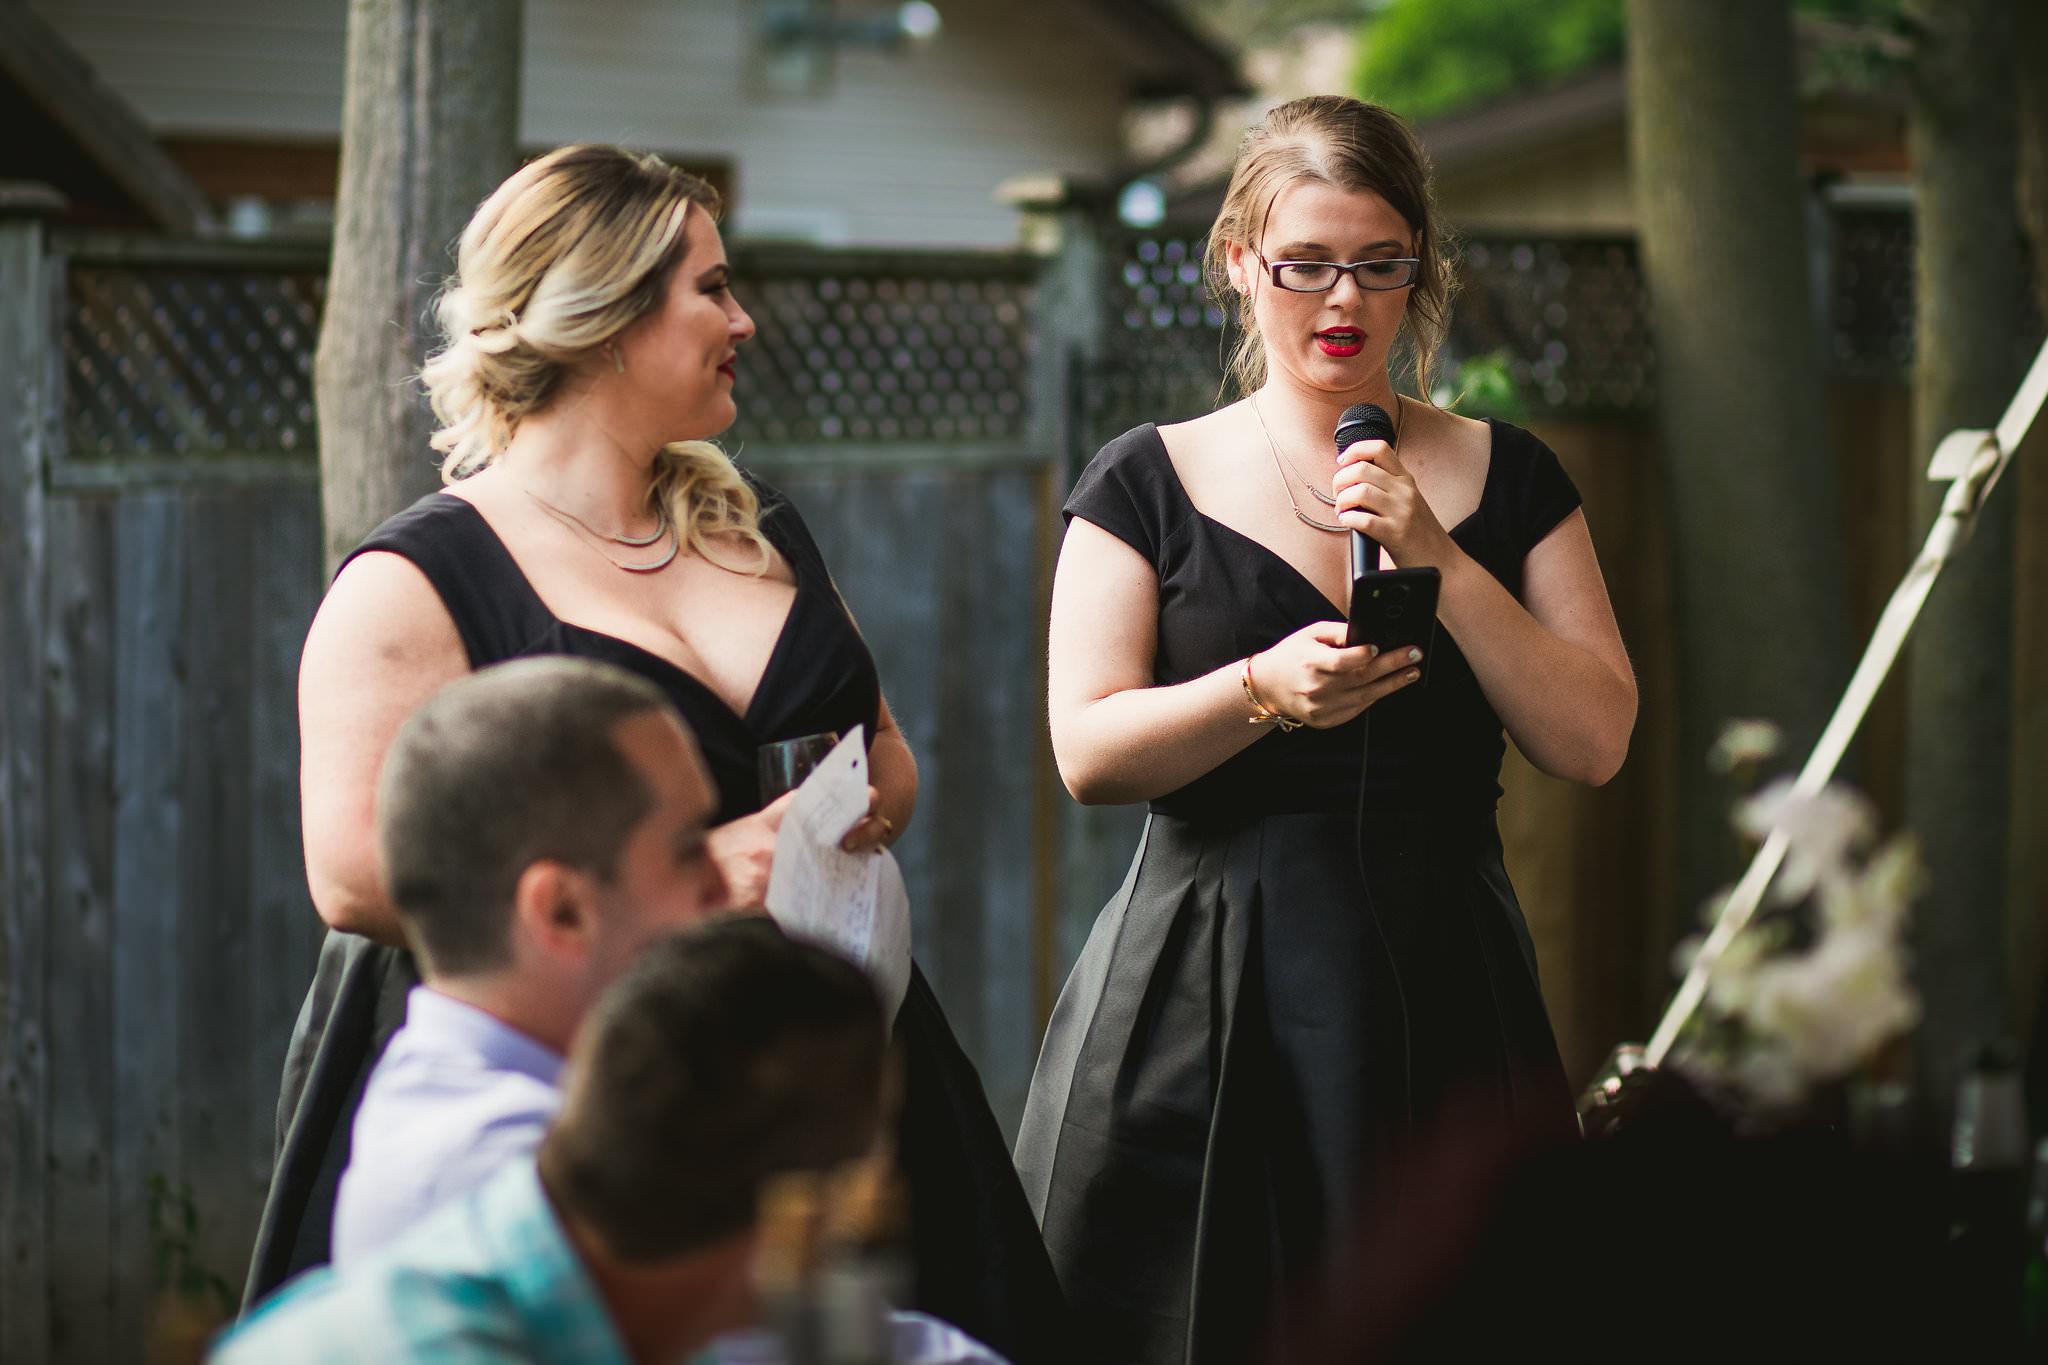 Kristen Adam Kindred Loft Whitby Wedding Photos 504 - Durham Wedding Photographer: Kindred Loft Wedding Photos